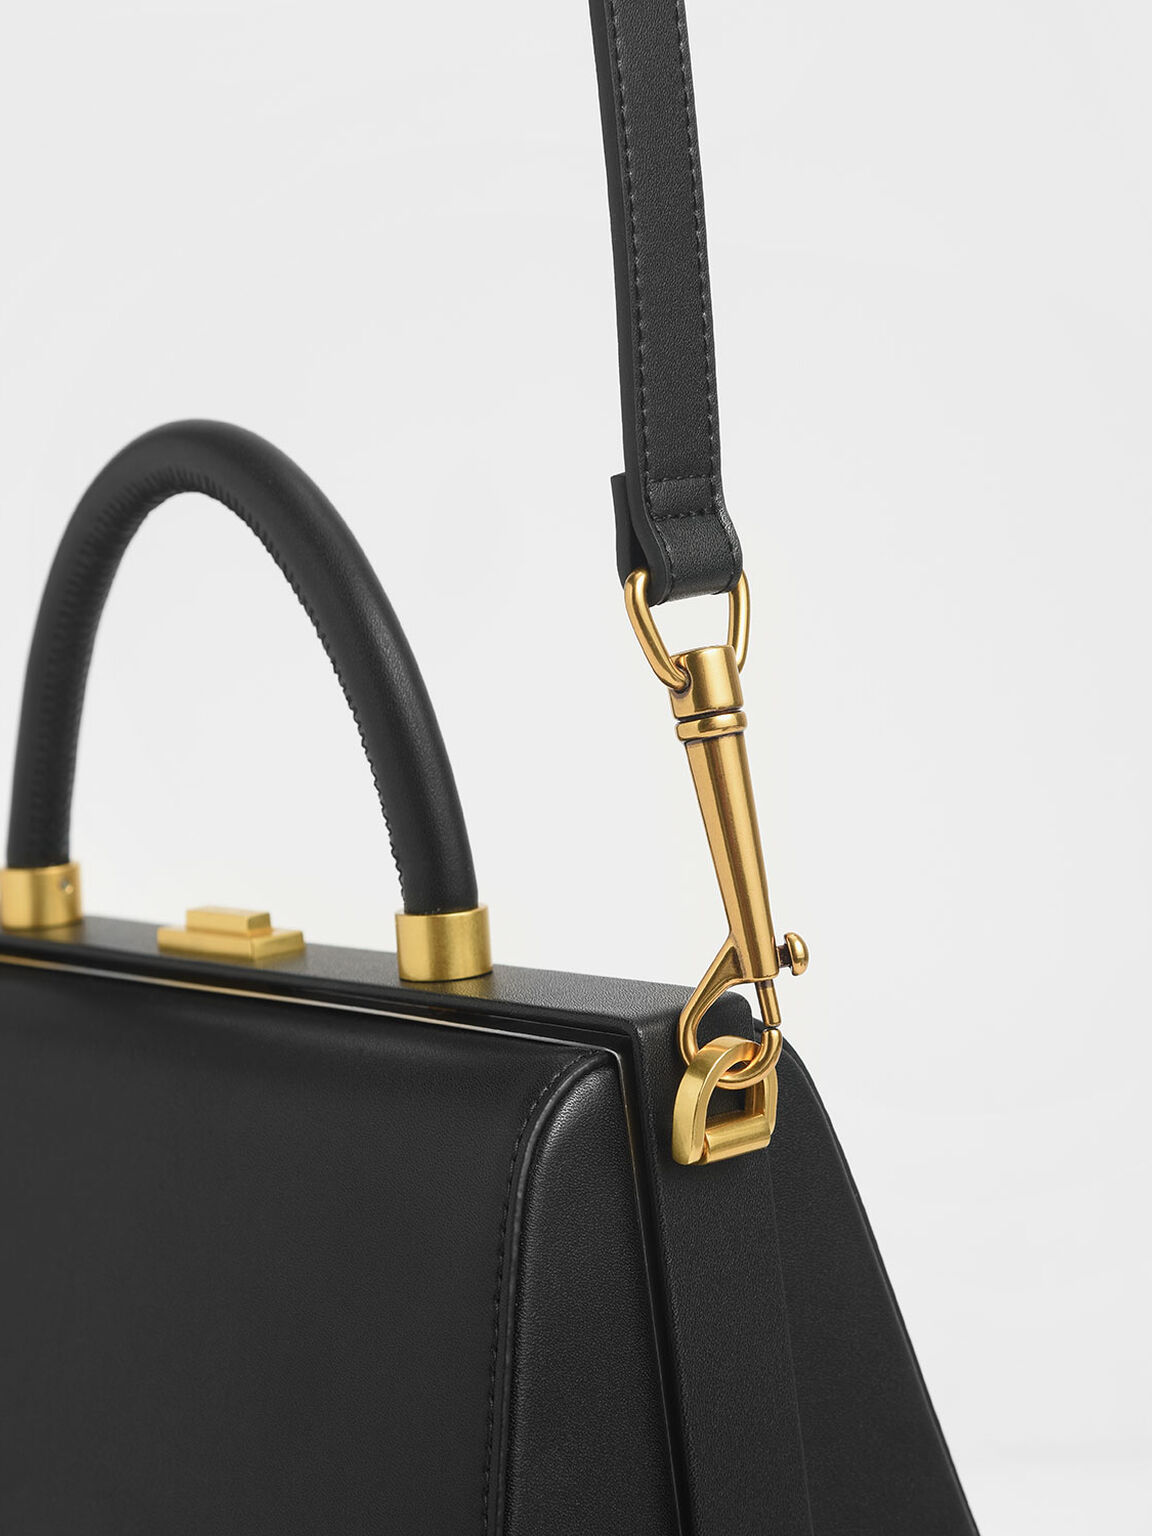 Large Accordion Top Handle Bag, Black Textured, hi-res